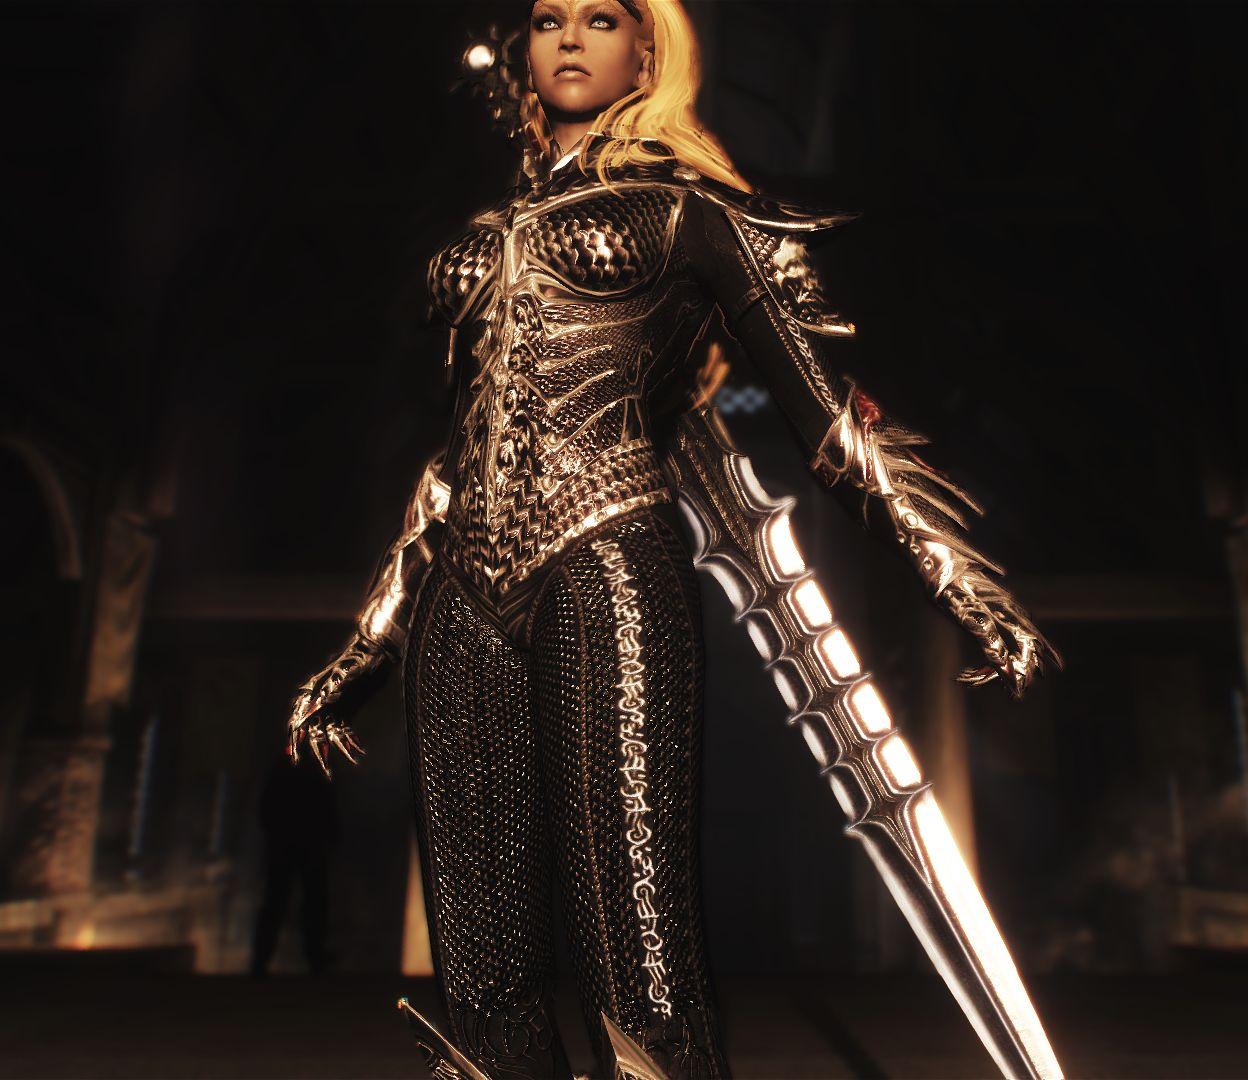 10.jpg - Elder Scrolls 5: Skyrim, the